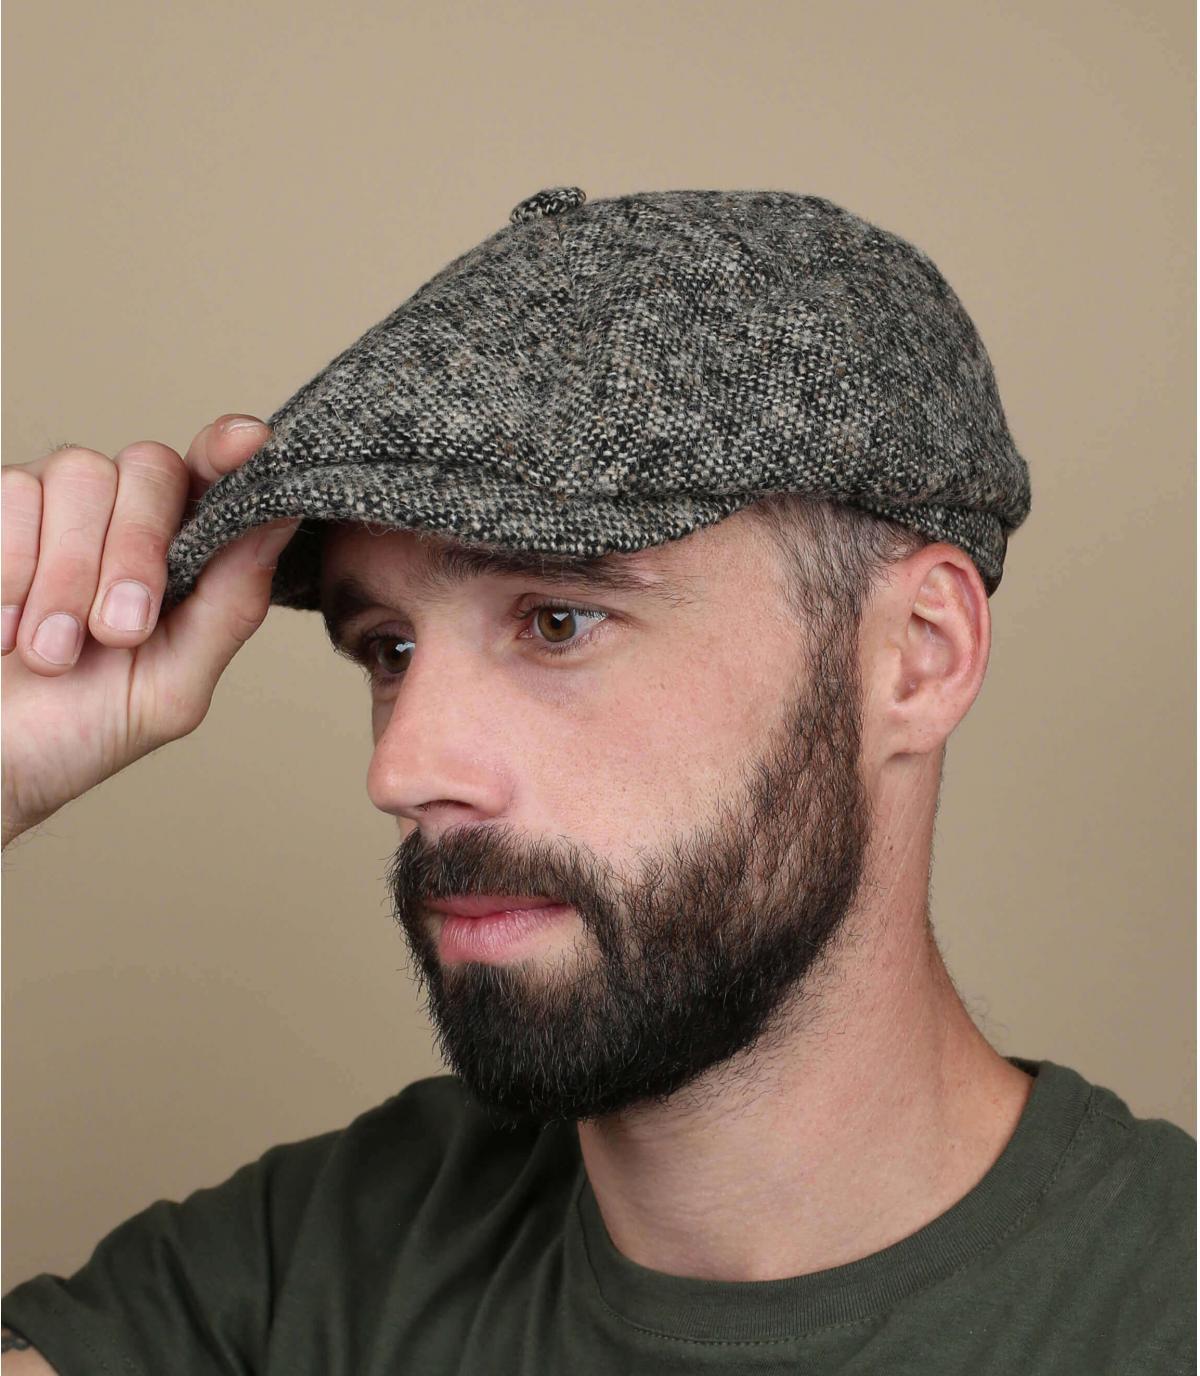 Rough wol cap